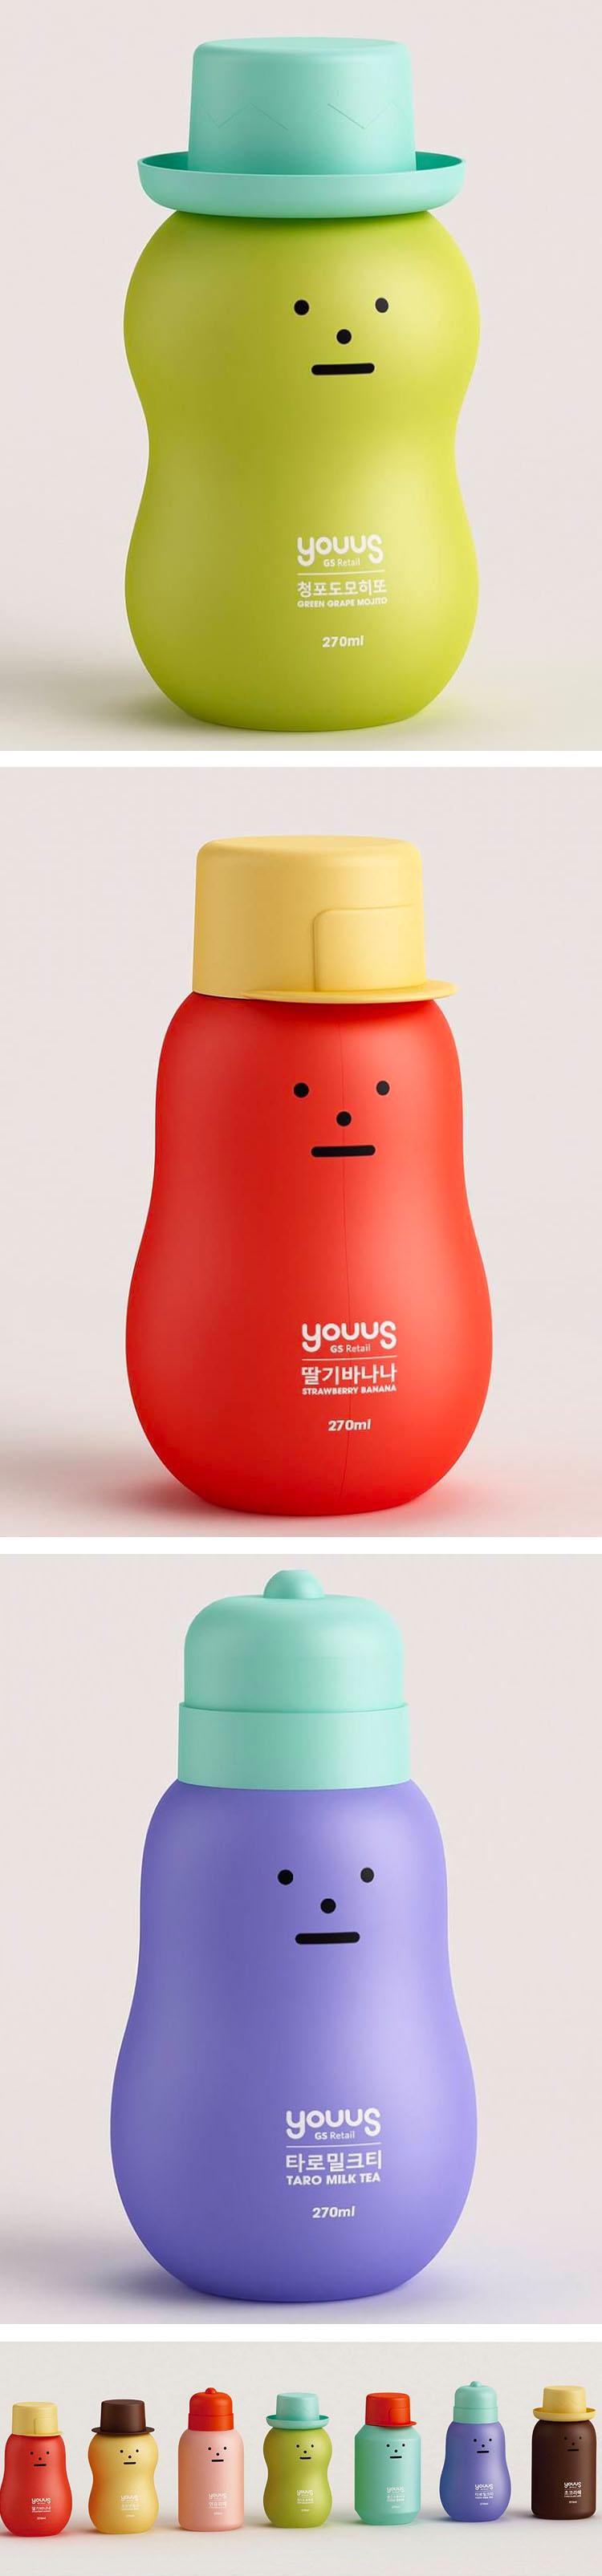 Sticky Monster bottles packaging design @forpackad